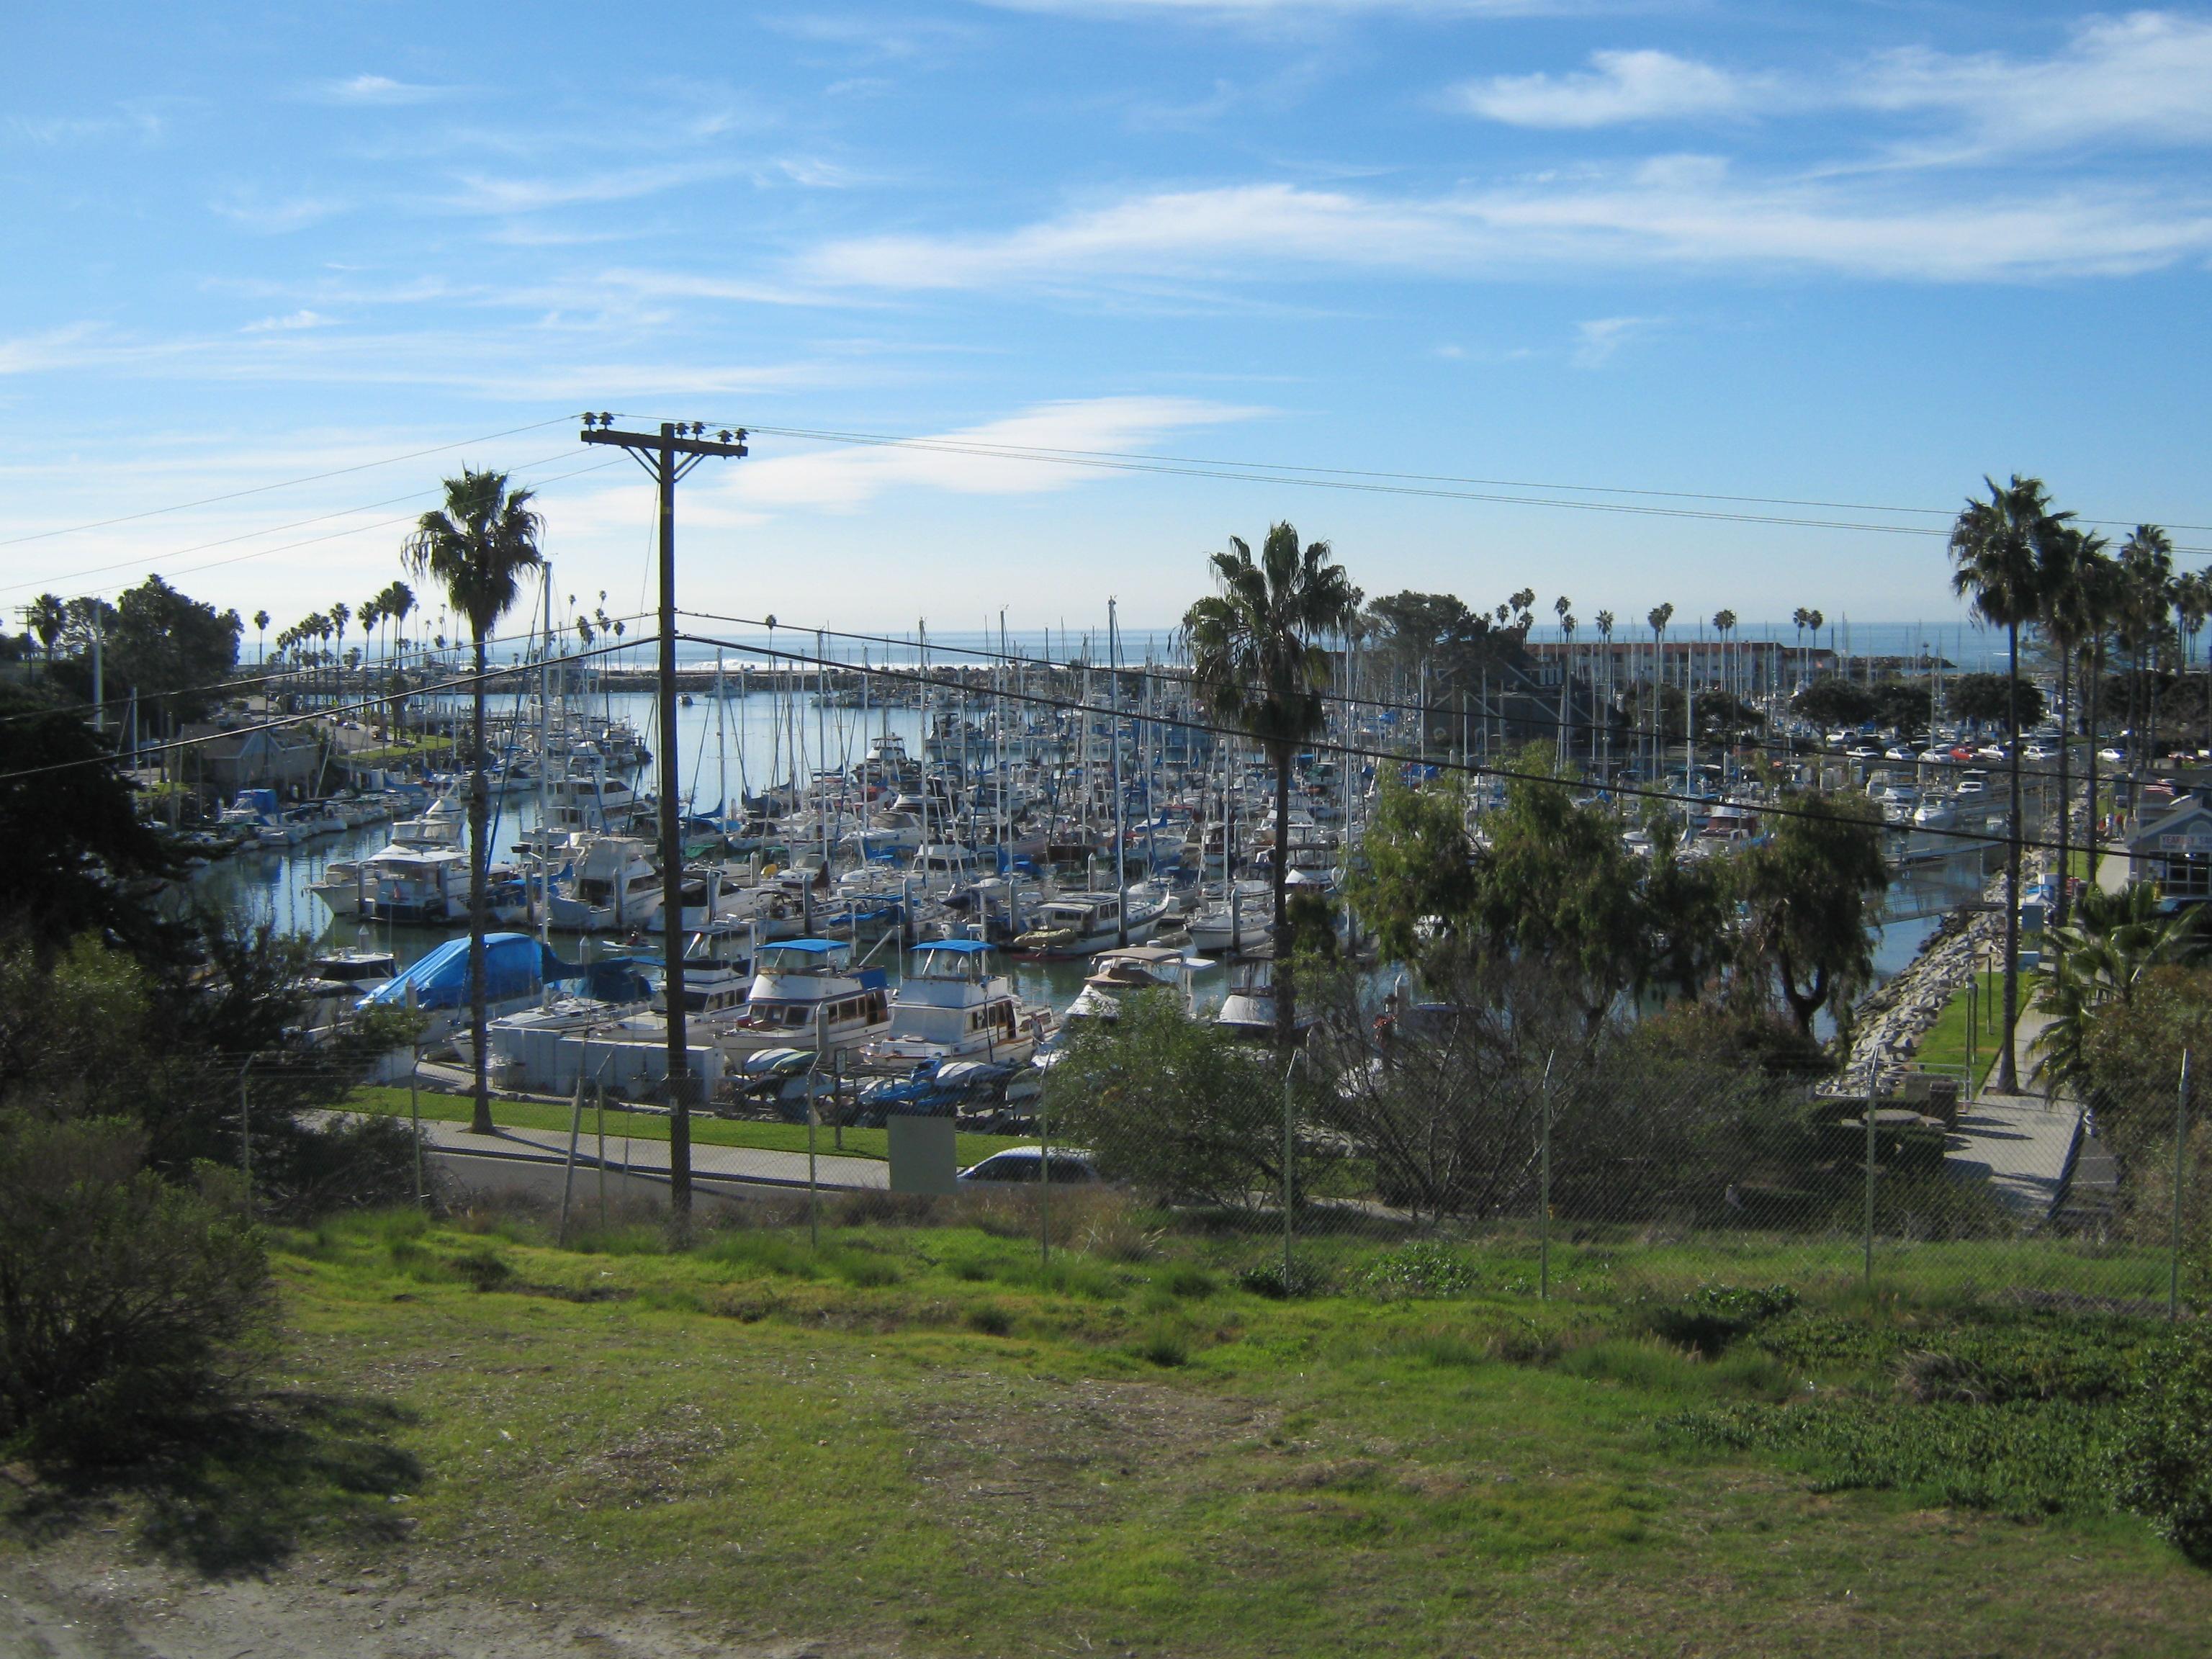 File:Marina at Camp Del Mar 001.jpg - Wikimedia Commons